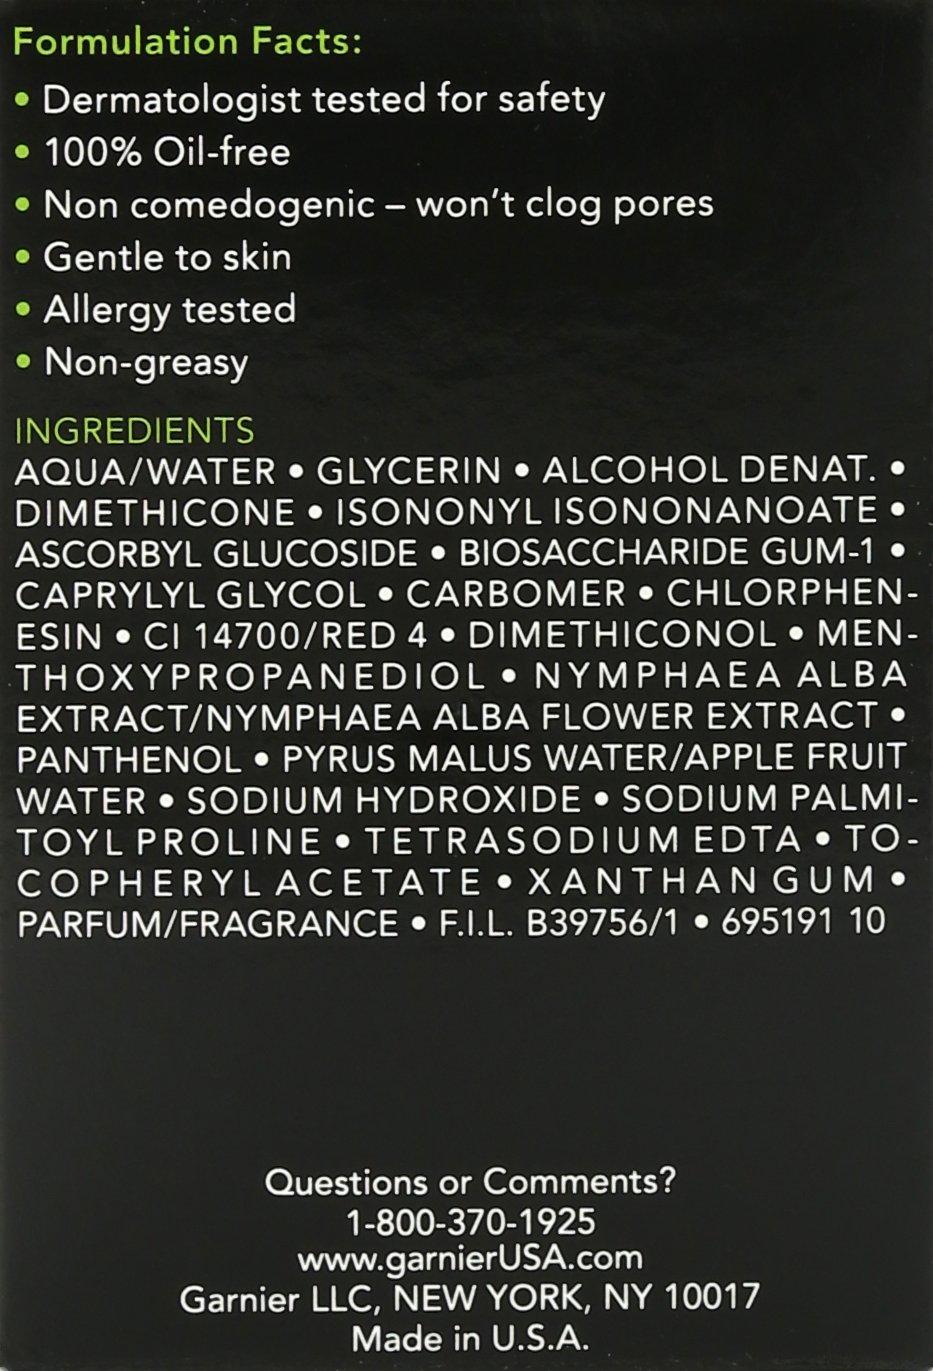 Garnier SkinActive Moisture Rescue Face Moisturizer, For Dry Skin, 1.7 oz.: Prime Pantry